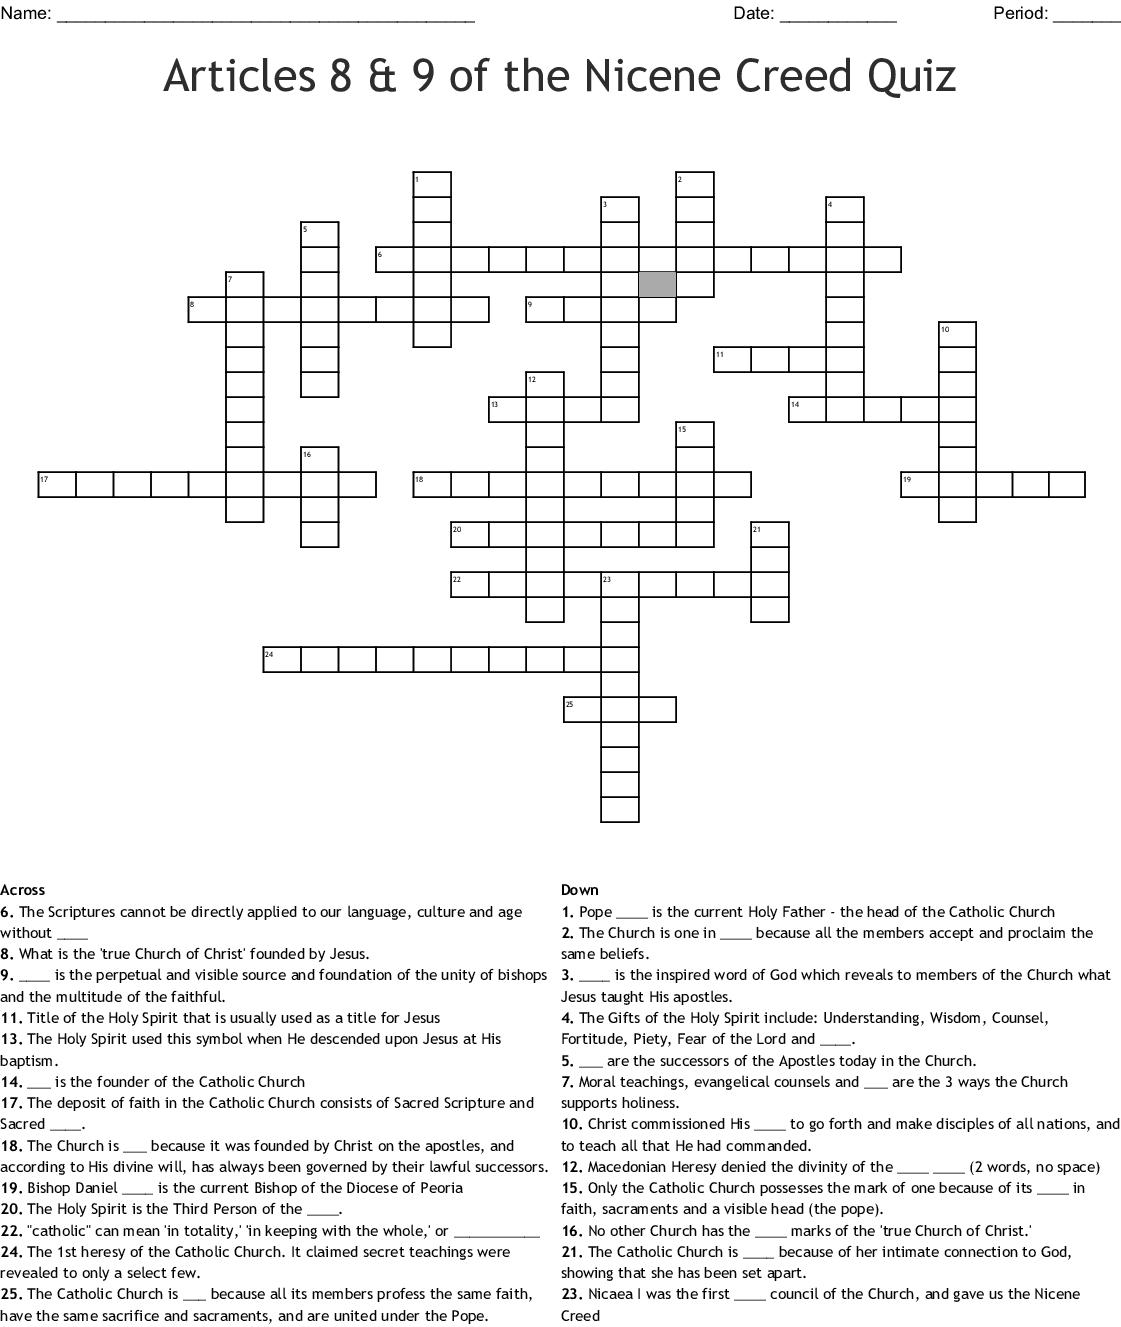 Articles 8 Amp 9 Of The Nicene Creed Quiz Crossword